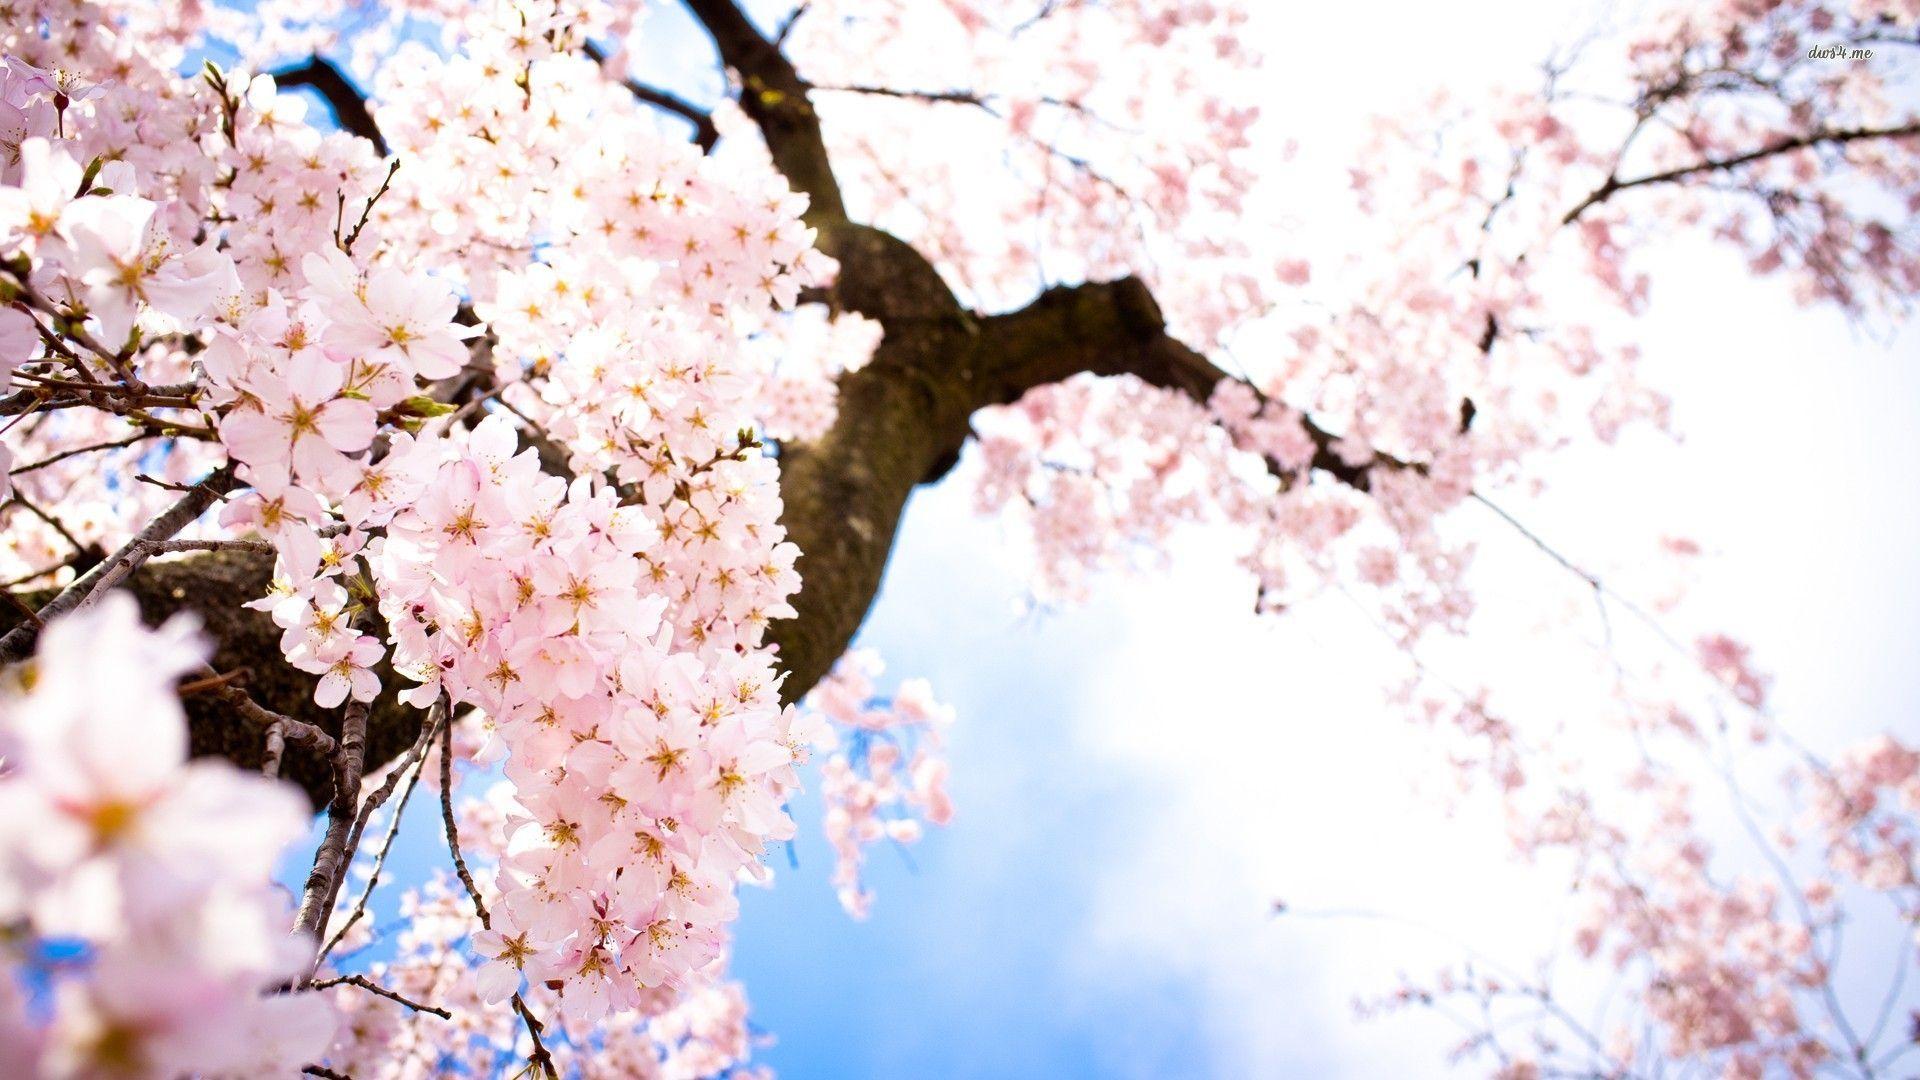 Pink Blossoms Hd Wallpaper Hoa Anh đao Hoa Hinh Nền